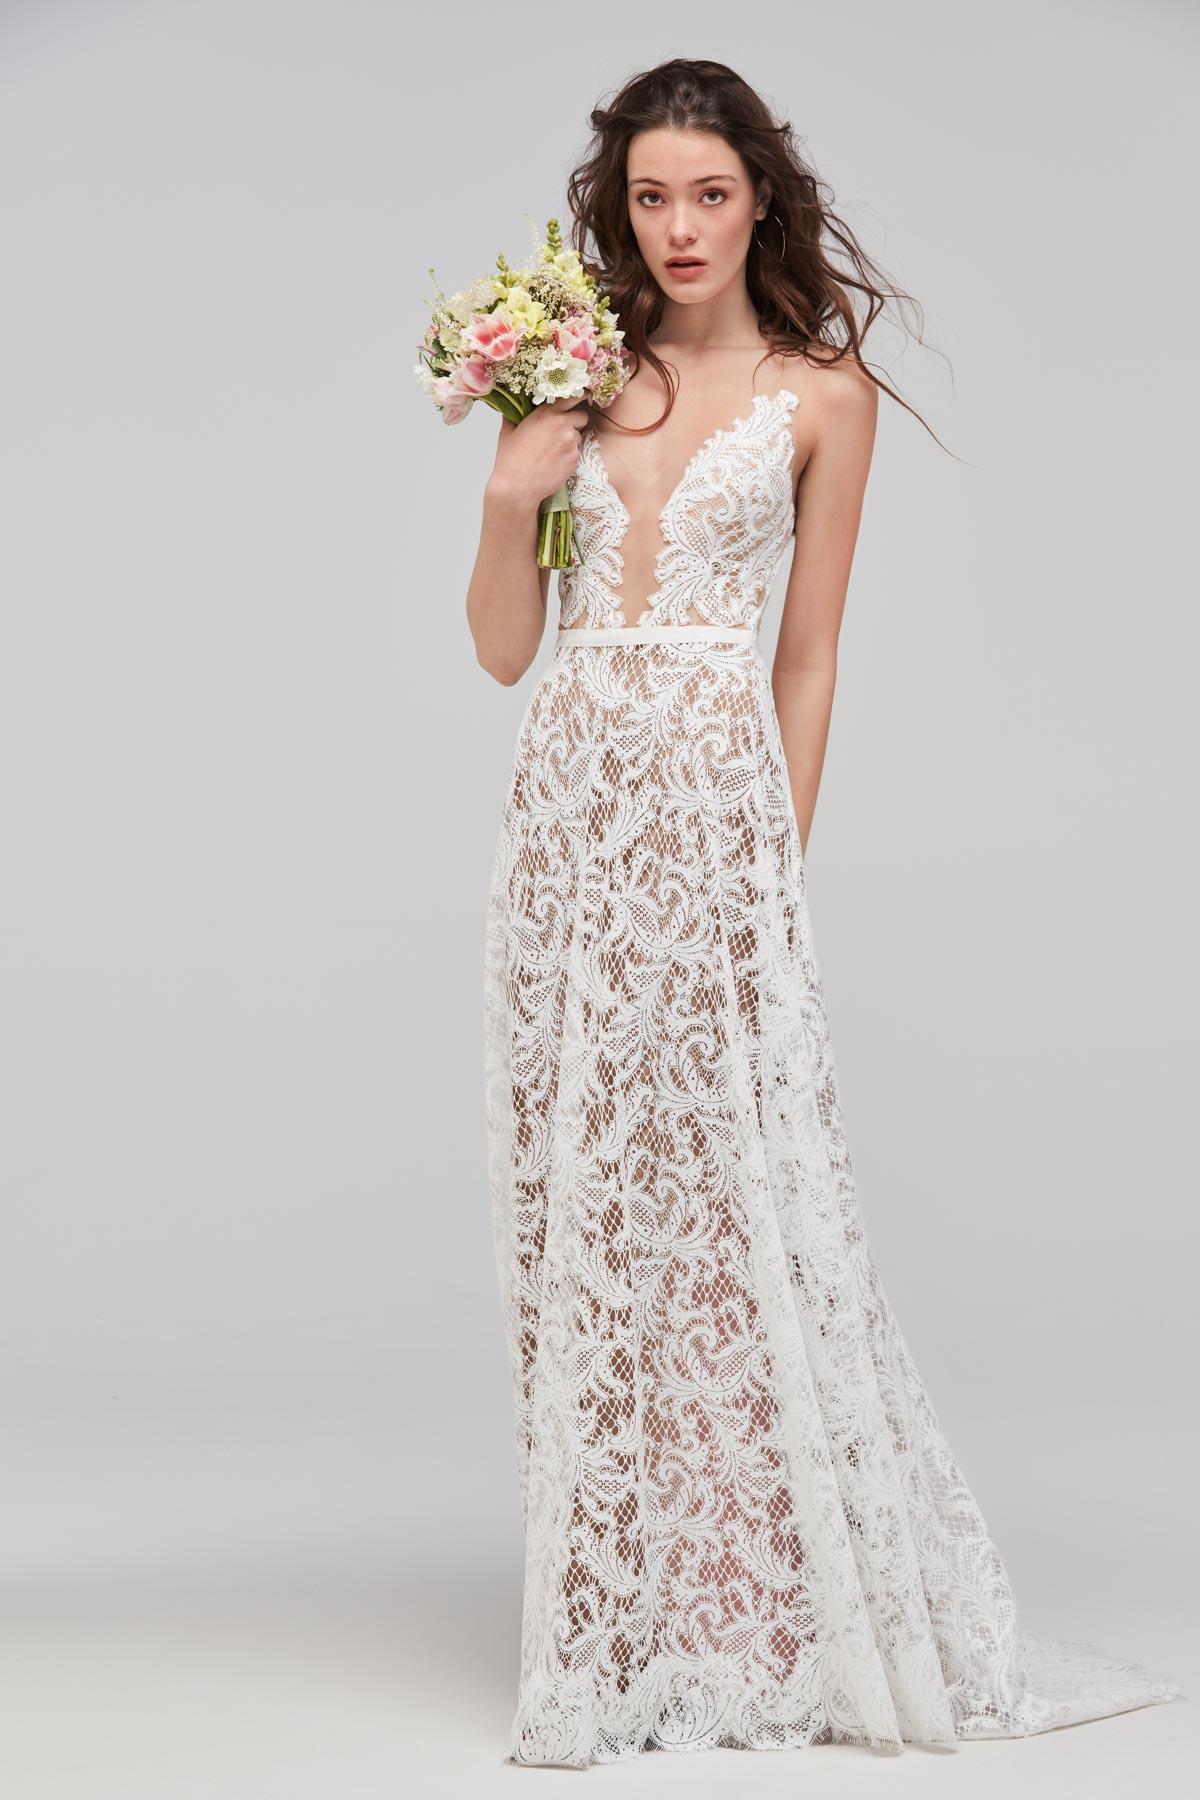 Asa 59120   Willowby Brides   Willowby